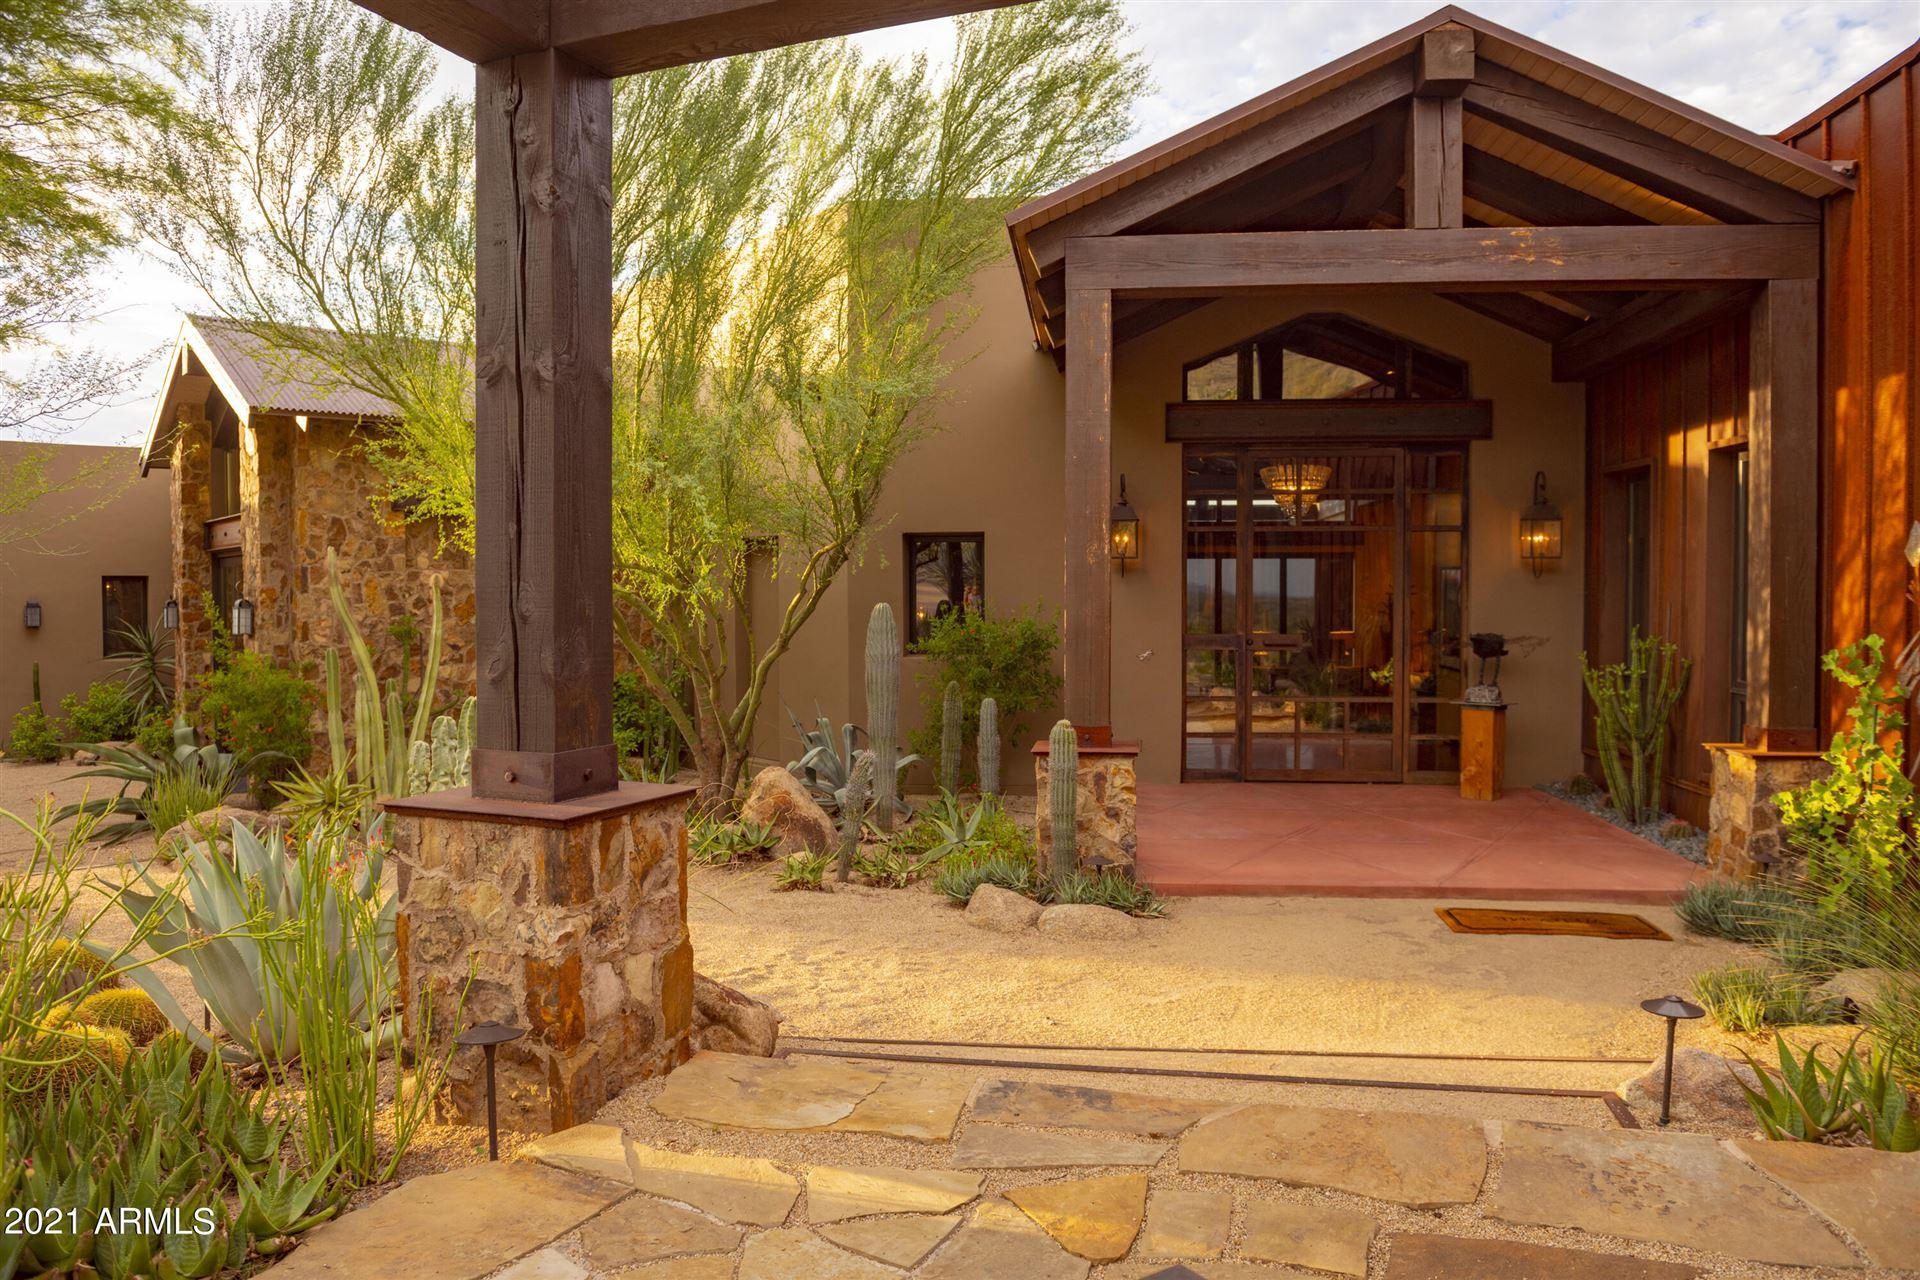 Photo of 6711 E El Sendero Road, Carefree, AZ 85377 (MLS # 6284877)